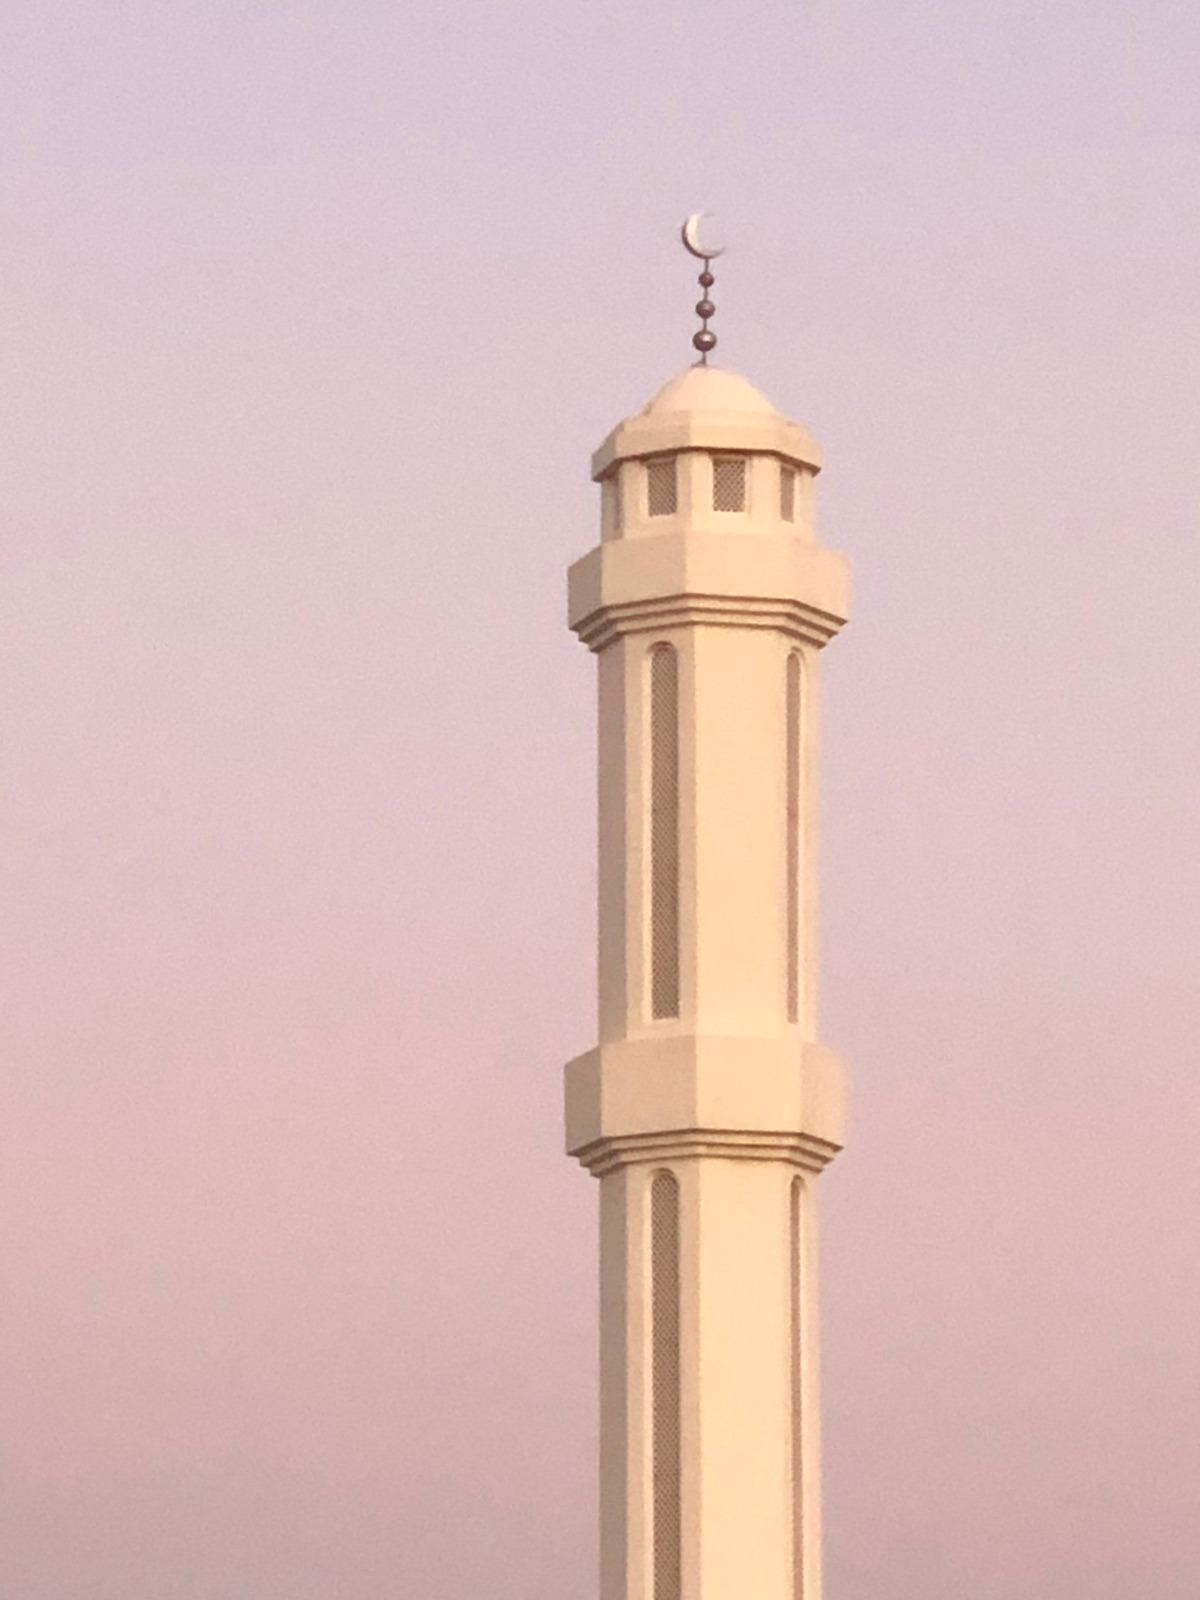 Minaret over the dusty sky